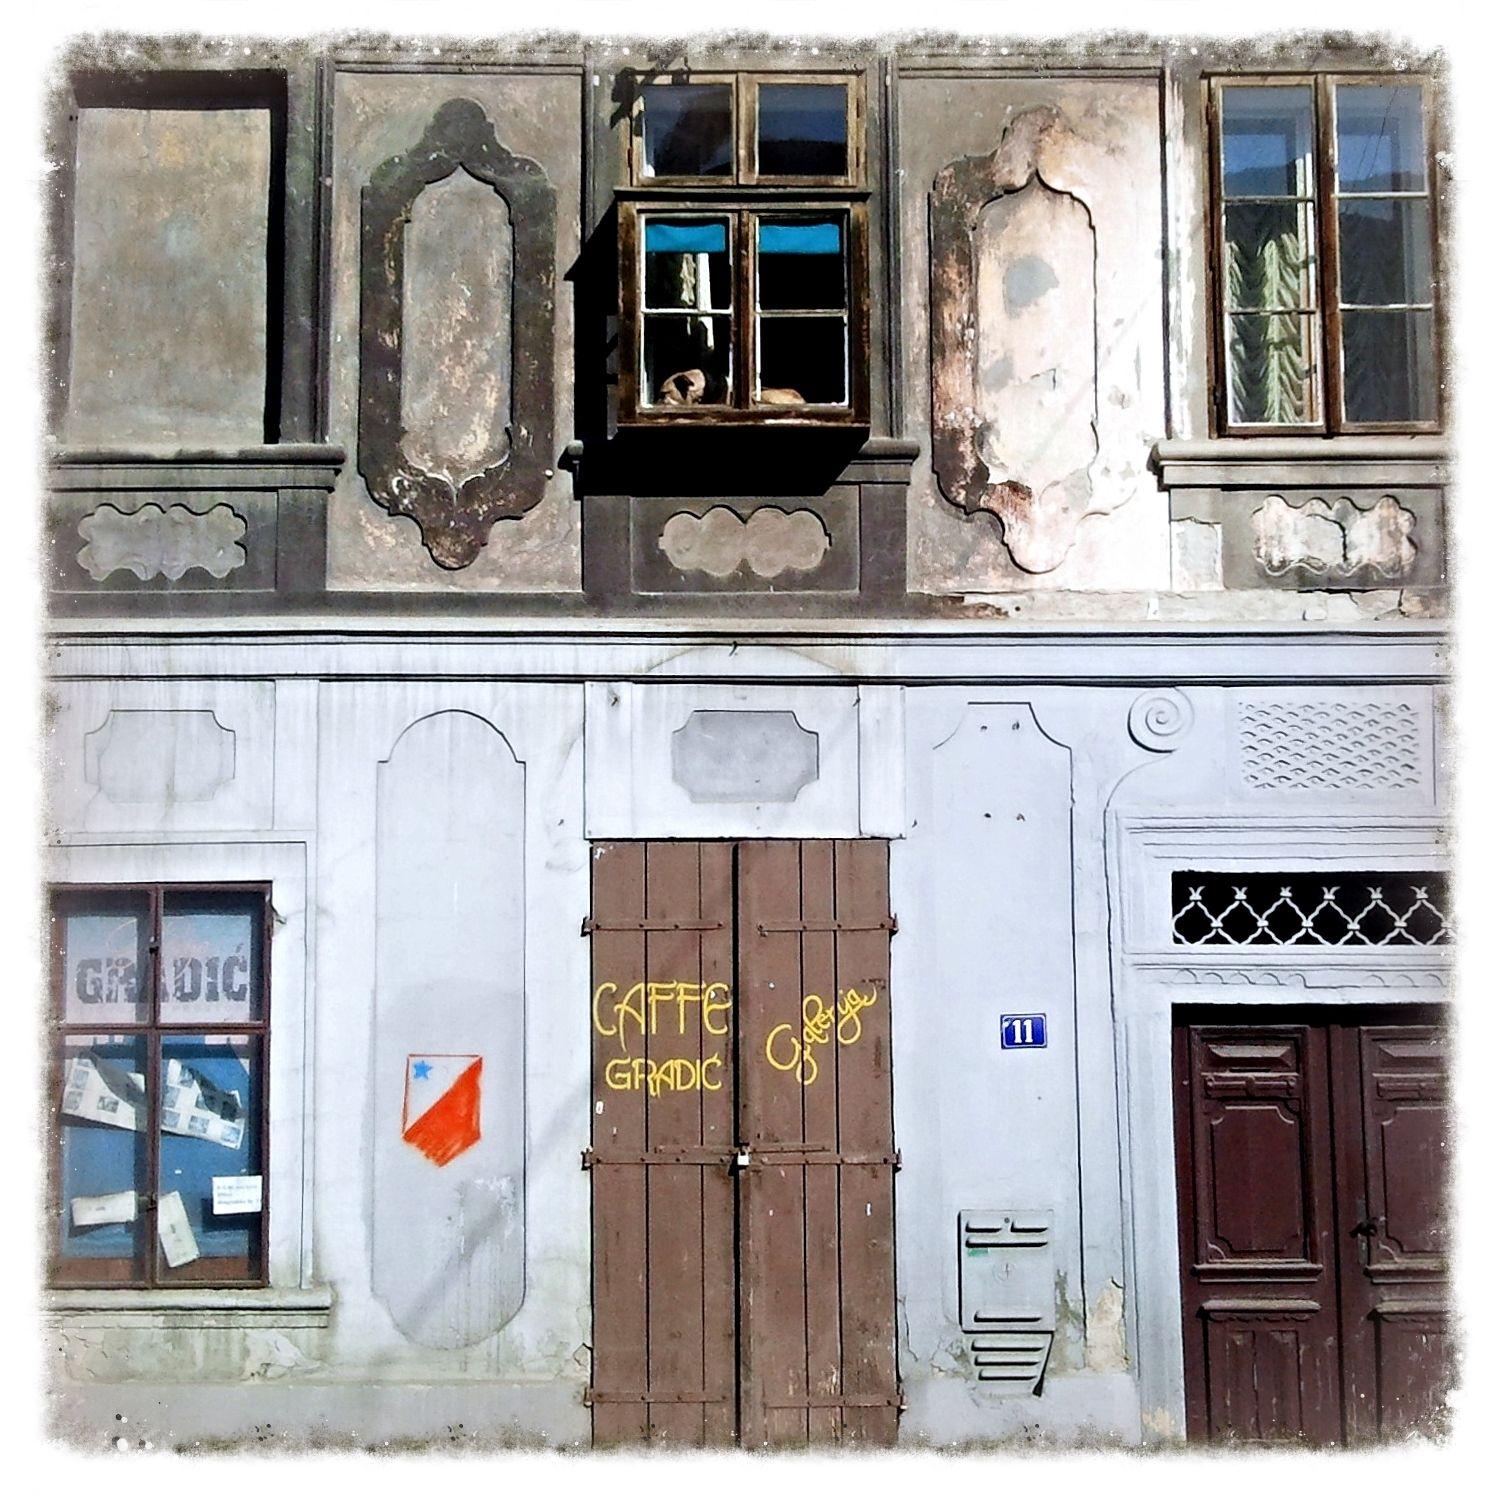 Pin on Petrovaradin (Novi Sad)